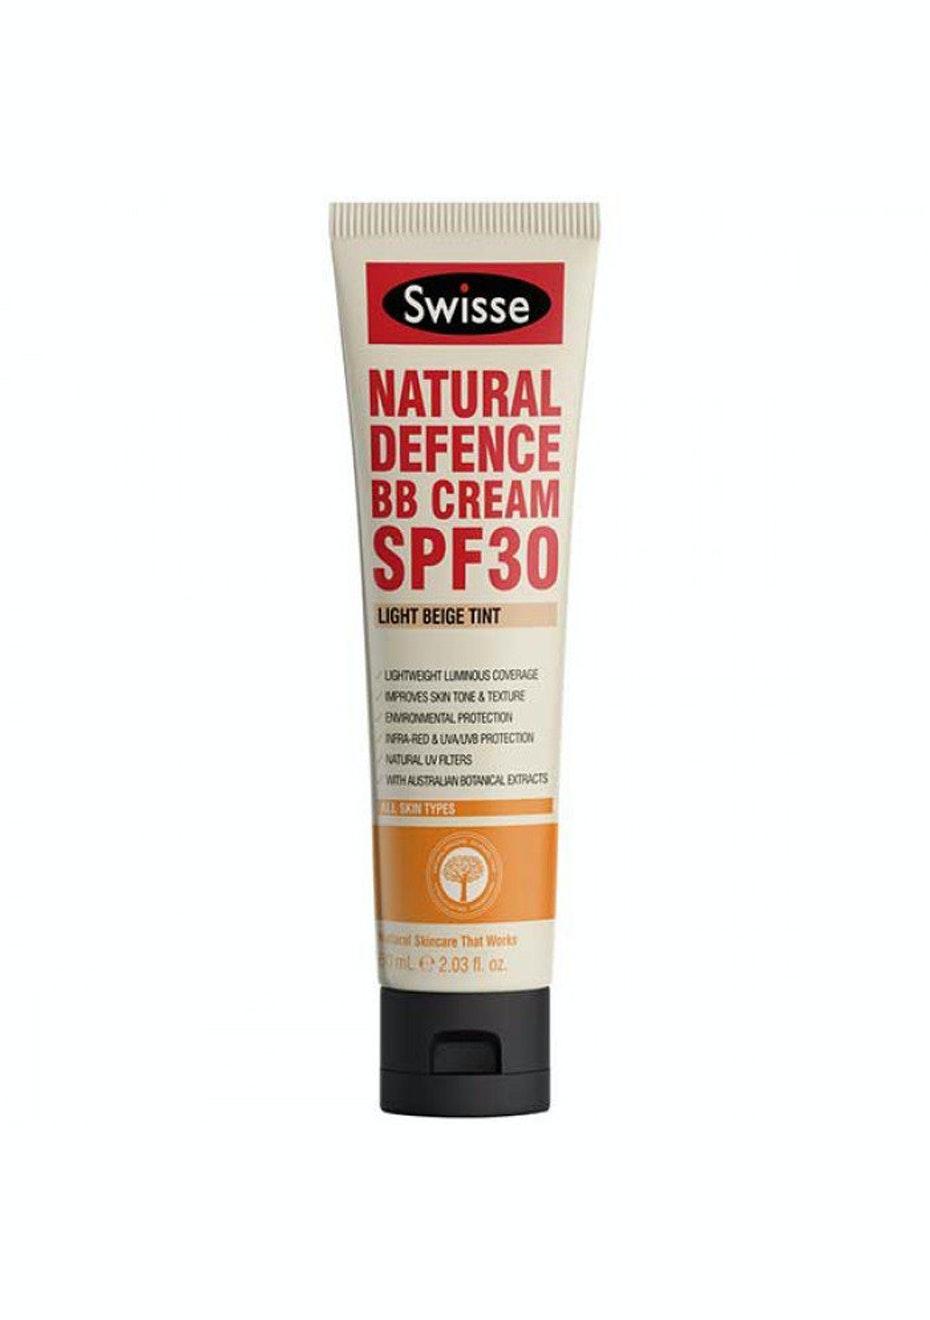 Swisse Natural Defence Bb Cream Spf 30 Light Beige 60Ml